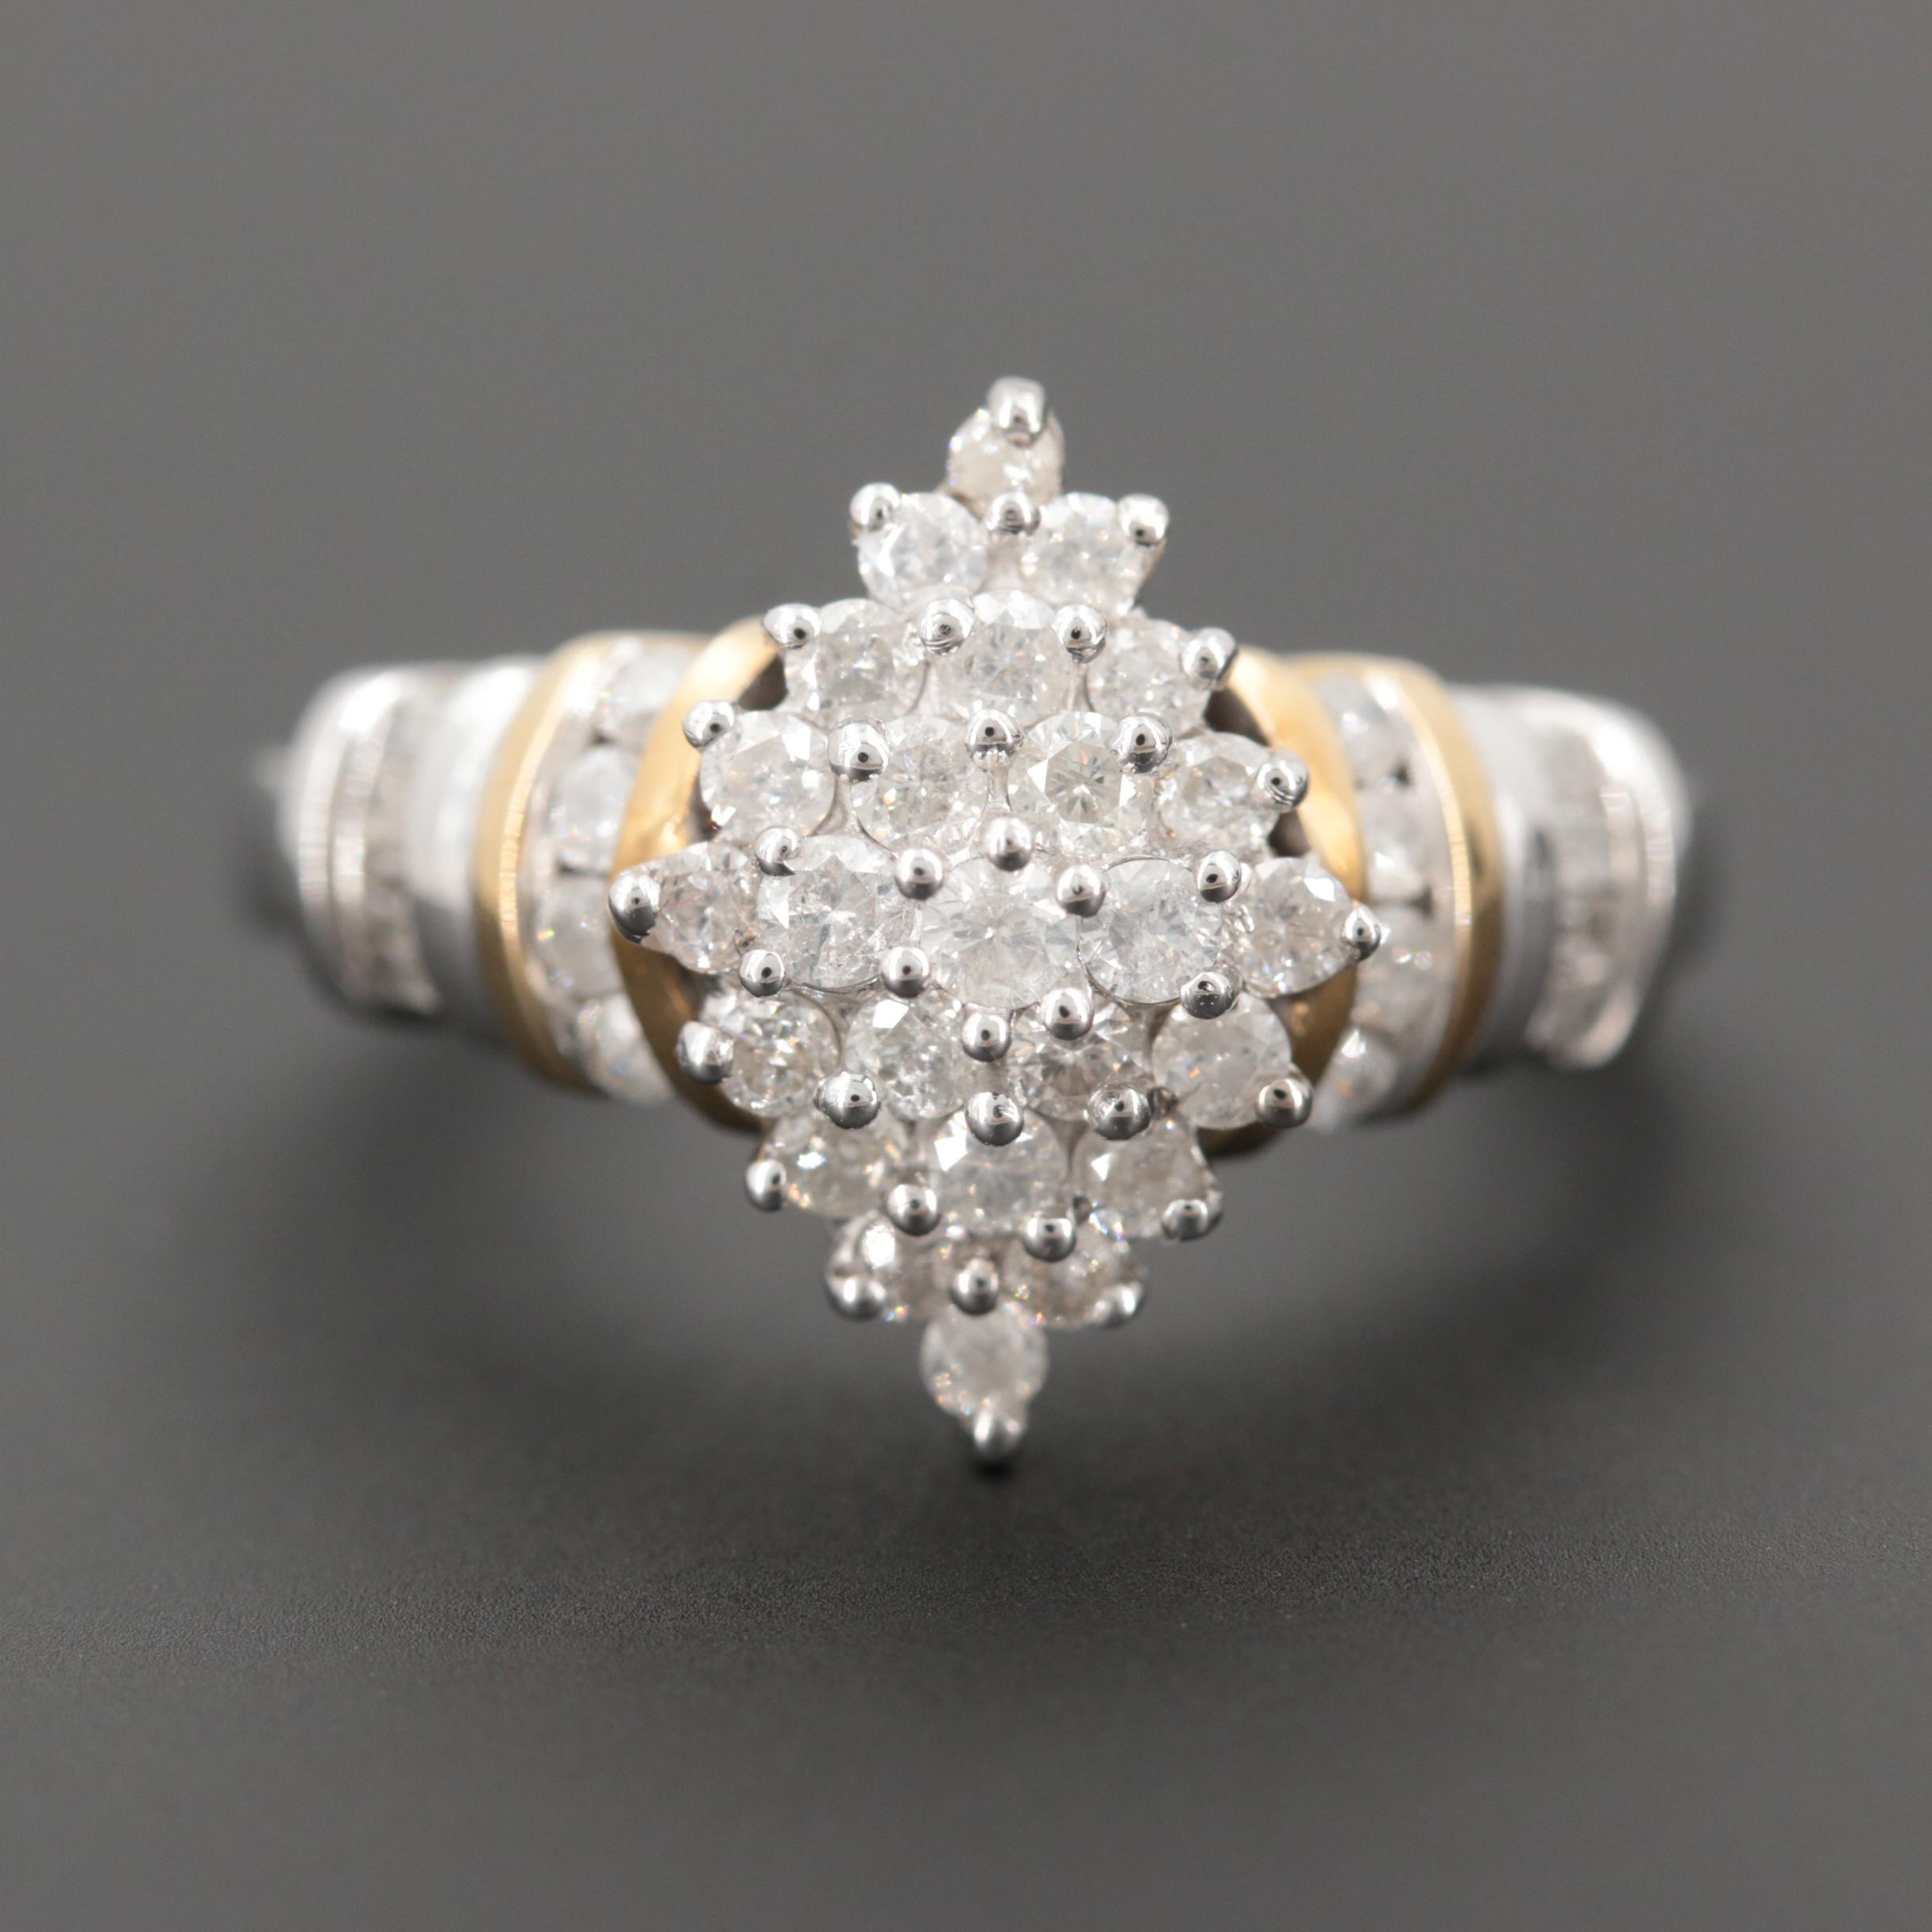 10K White Gold 1.02 CTW Diamond Ring